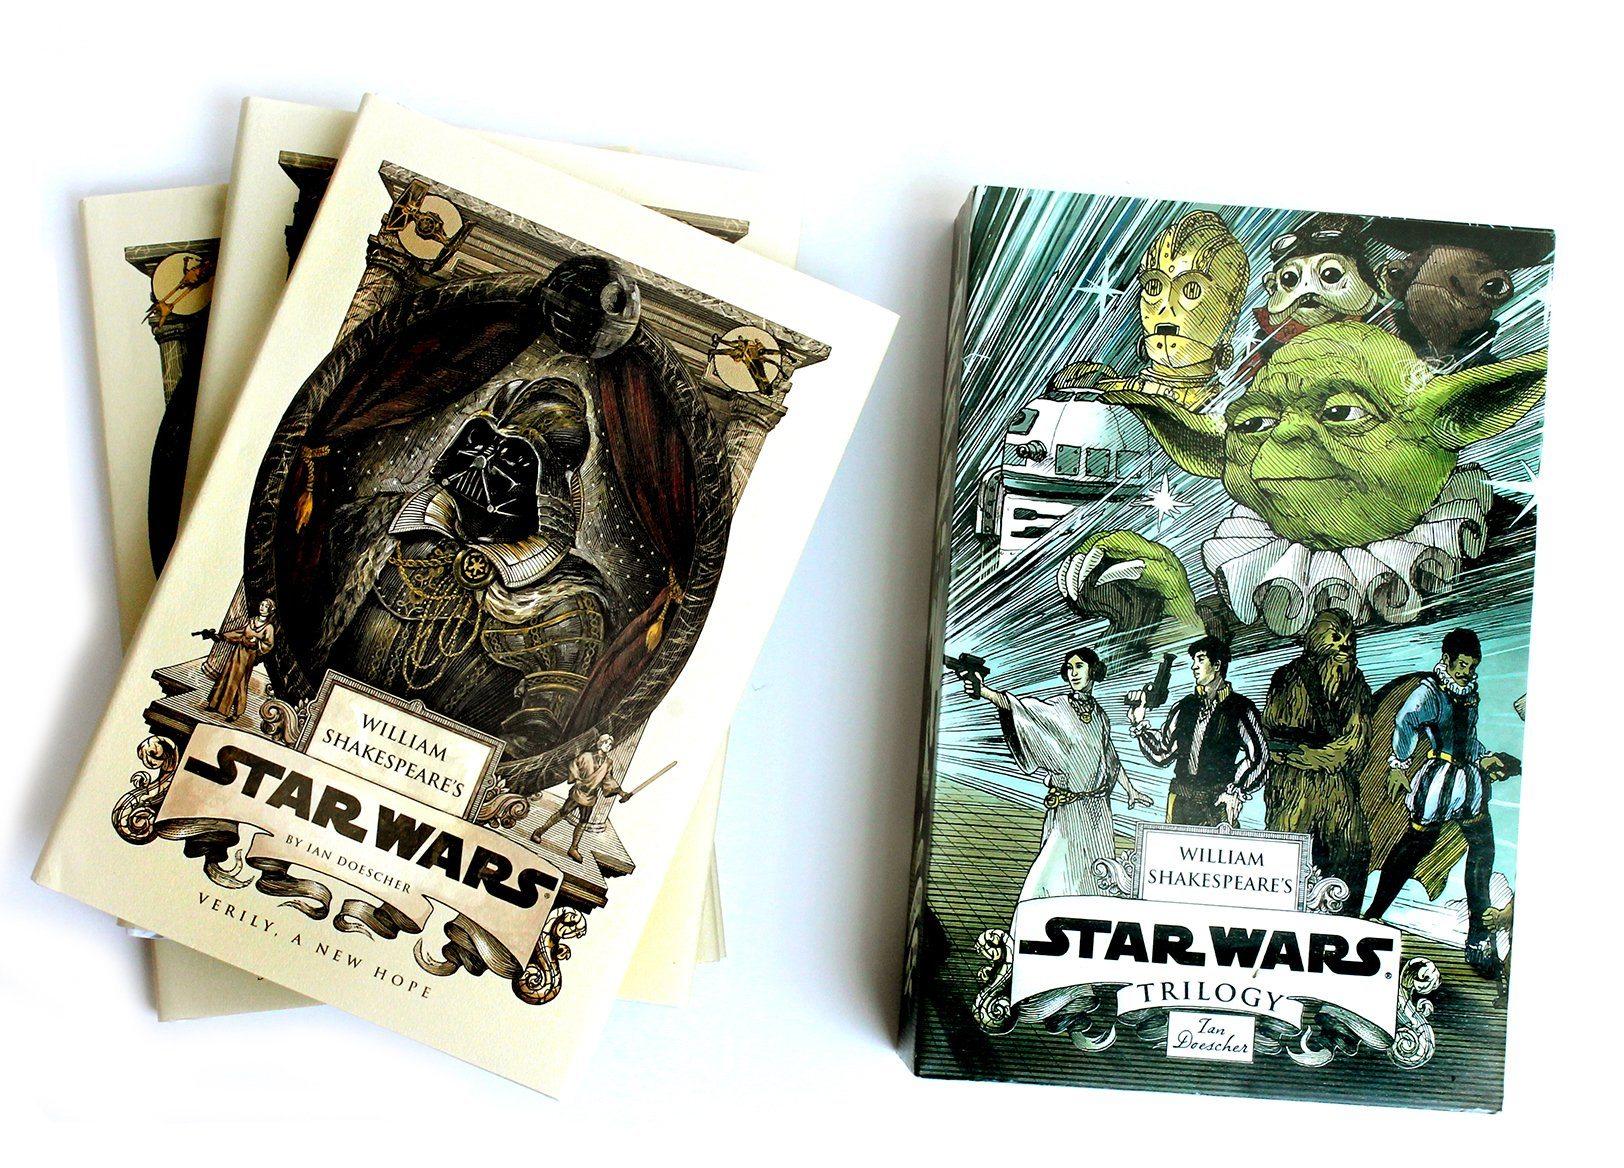 'William Shakespeare's Star Wars Trilogy'